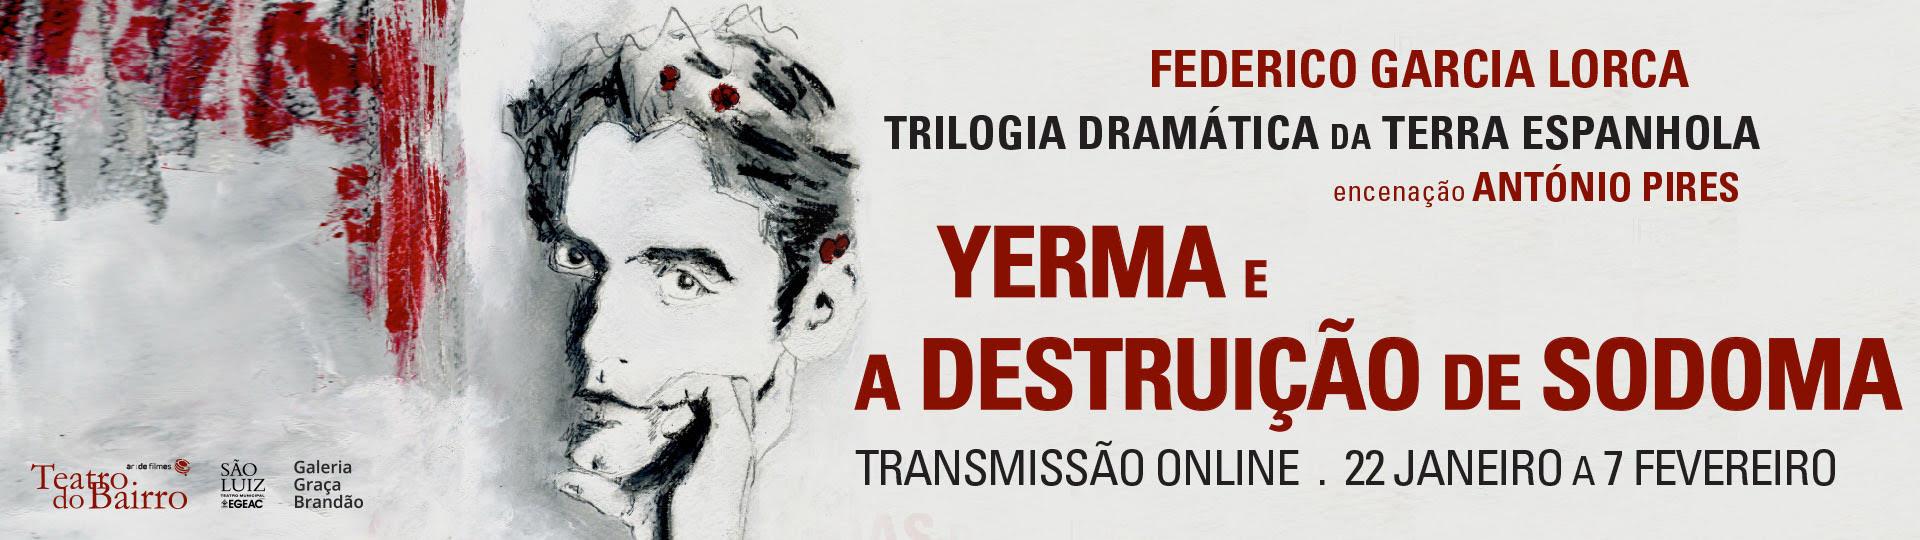 YERMA - Teatro do Bairro